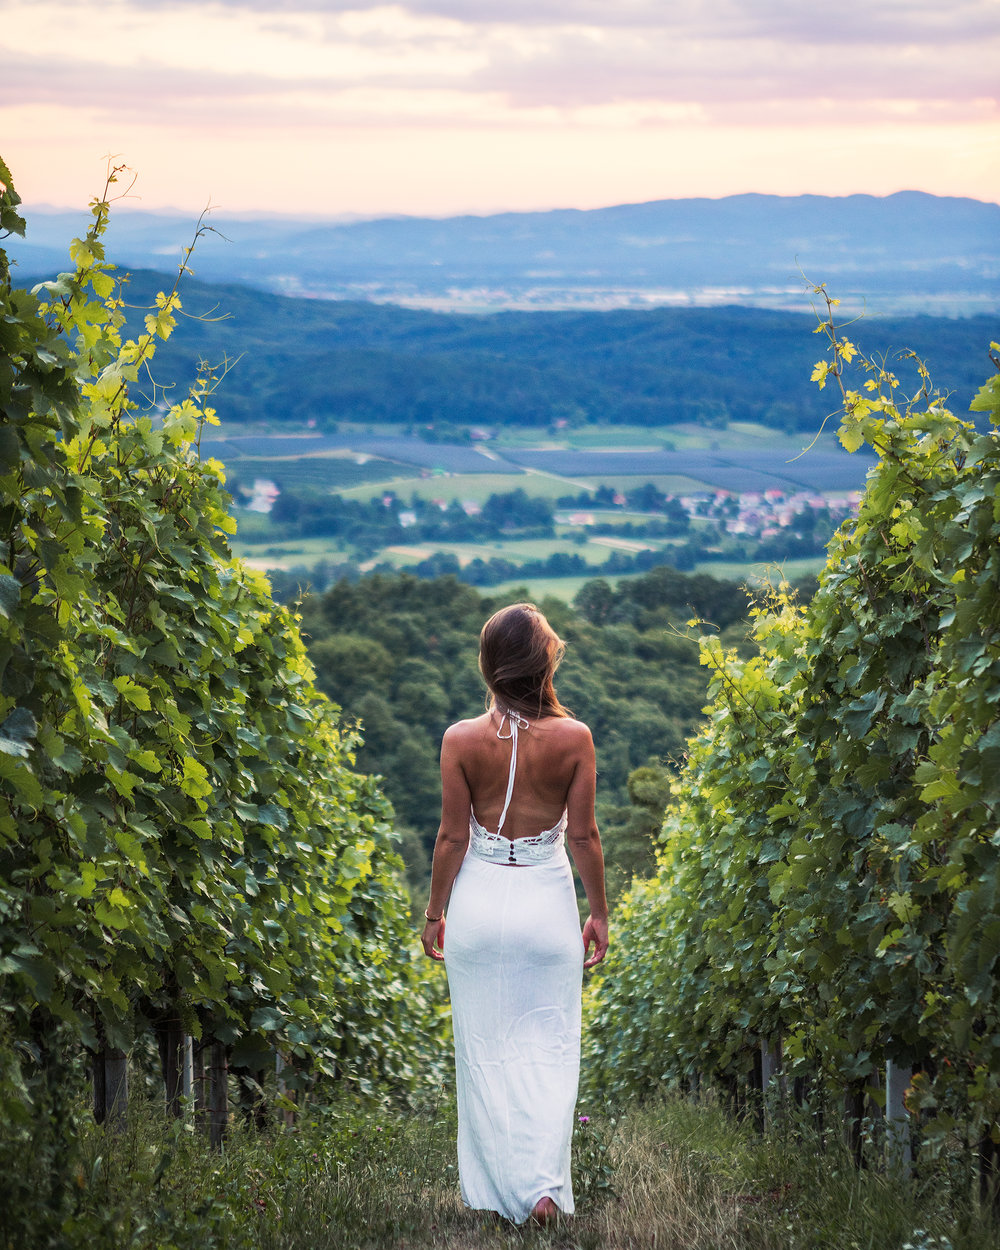 Vineyard-near-Kostanjevica-na-Krki-Slovenia-with-Andrea-by-Michael-Matti.jpg